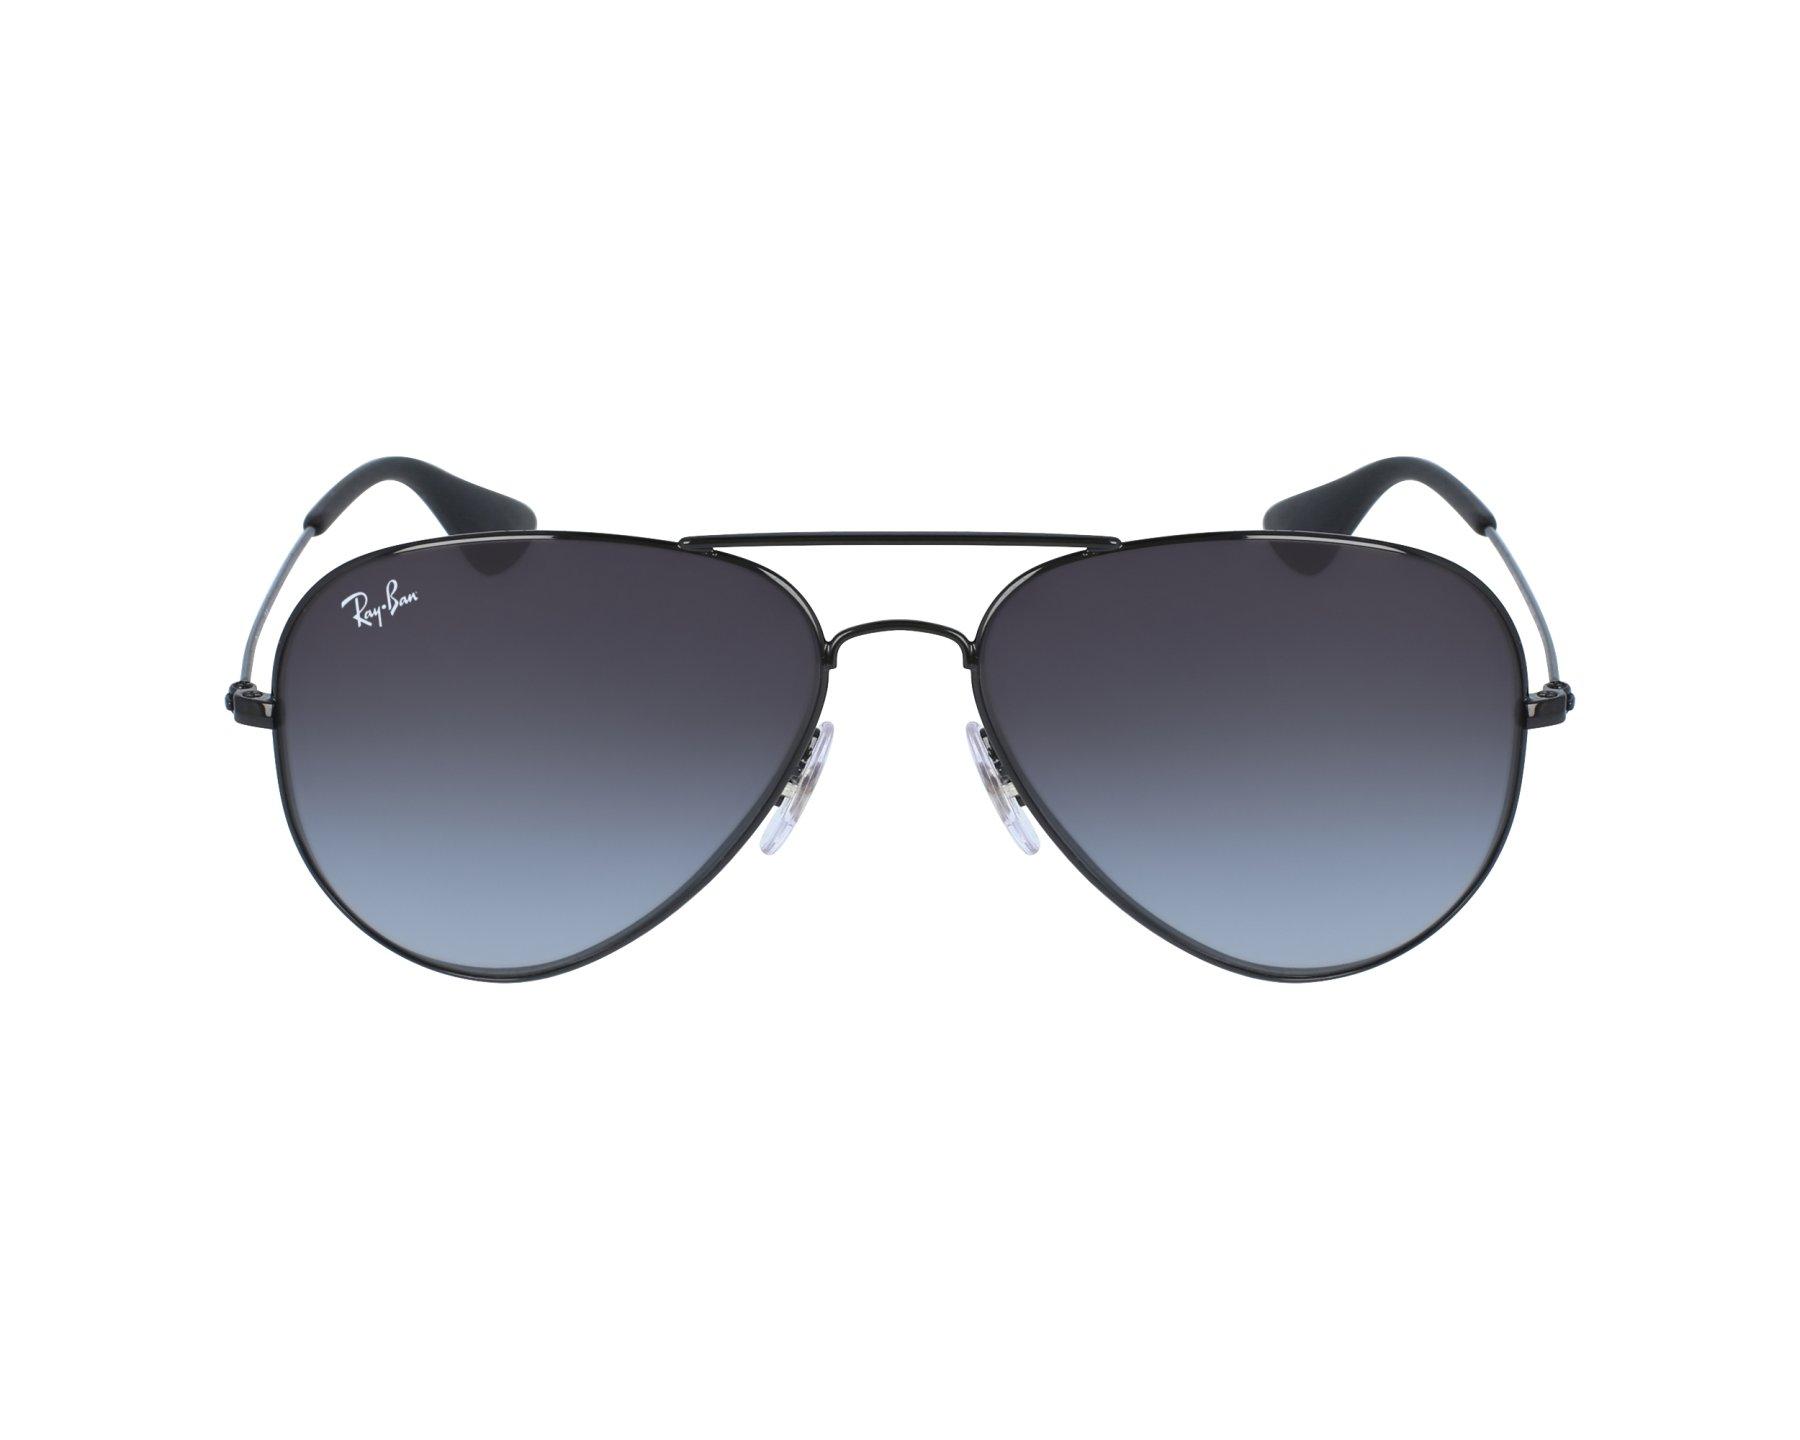 e44e766b66 Sunglasses Ray-Ban RB-3558 002 8G 58-14 Black profile view